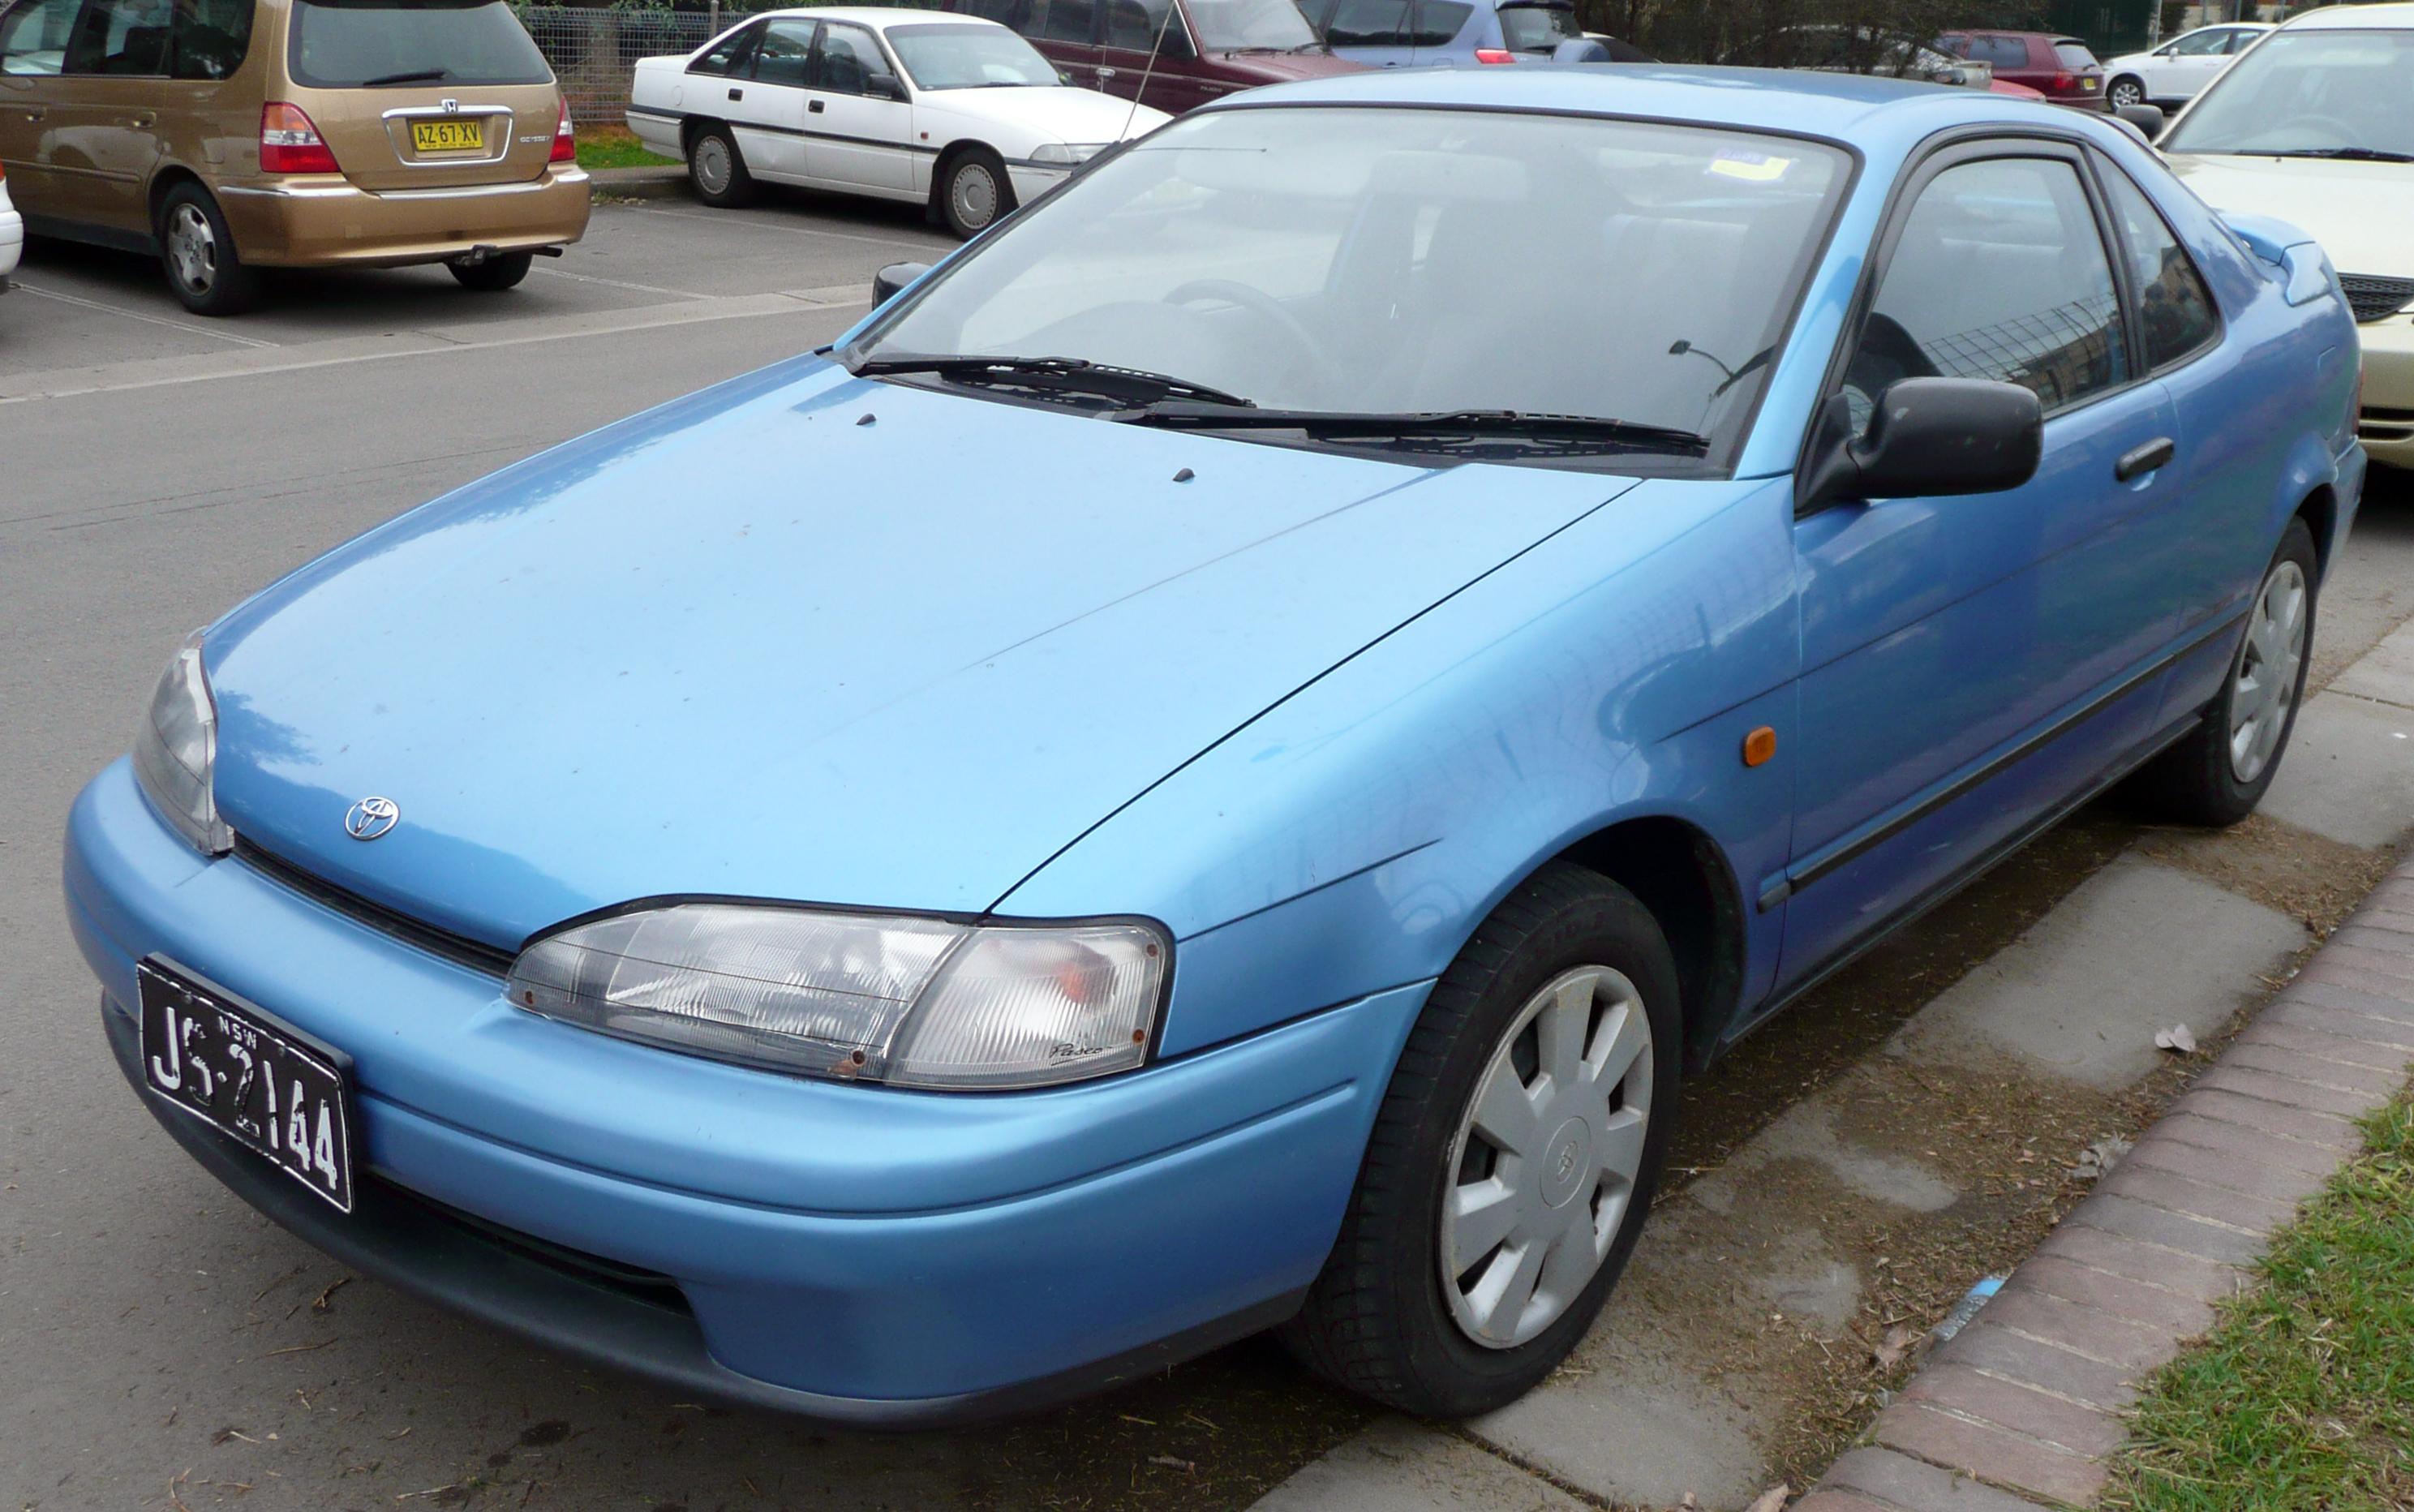 1994 Toyota Paseo Image 10